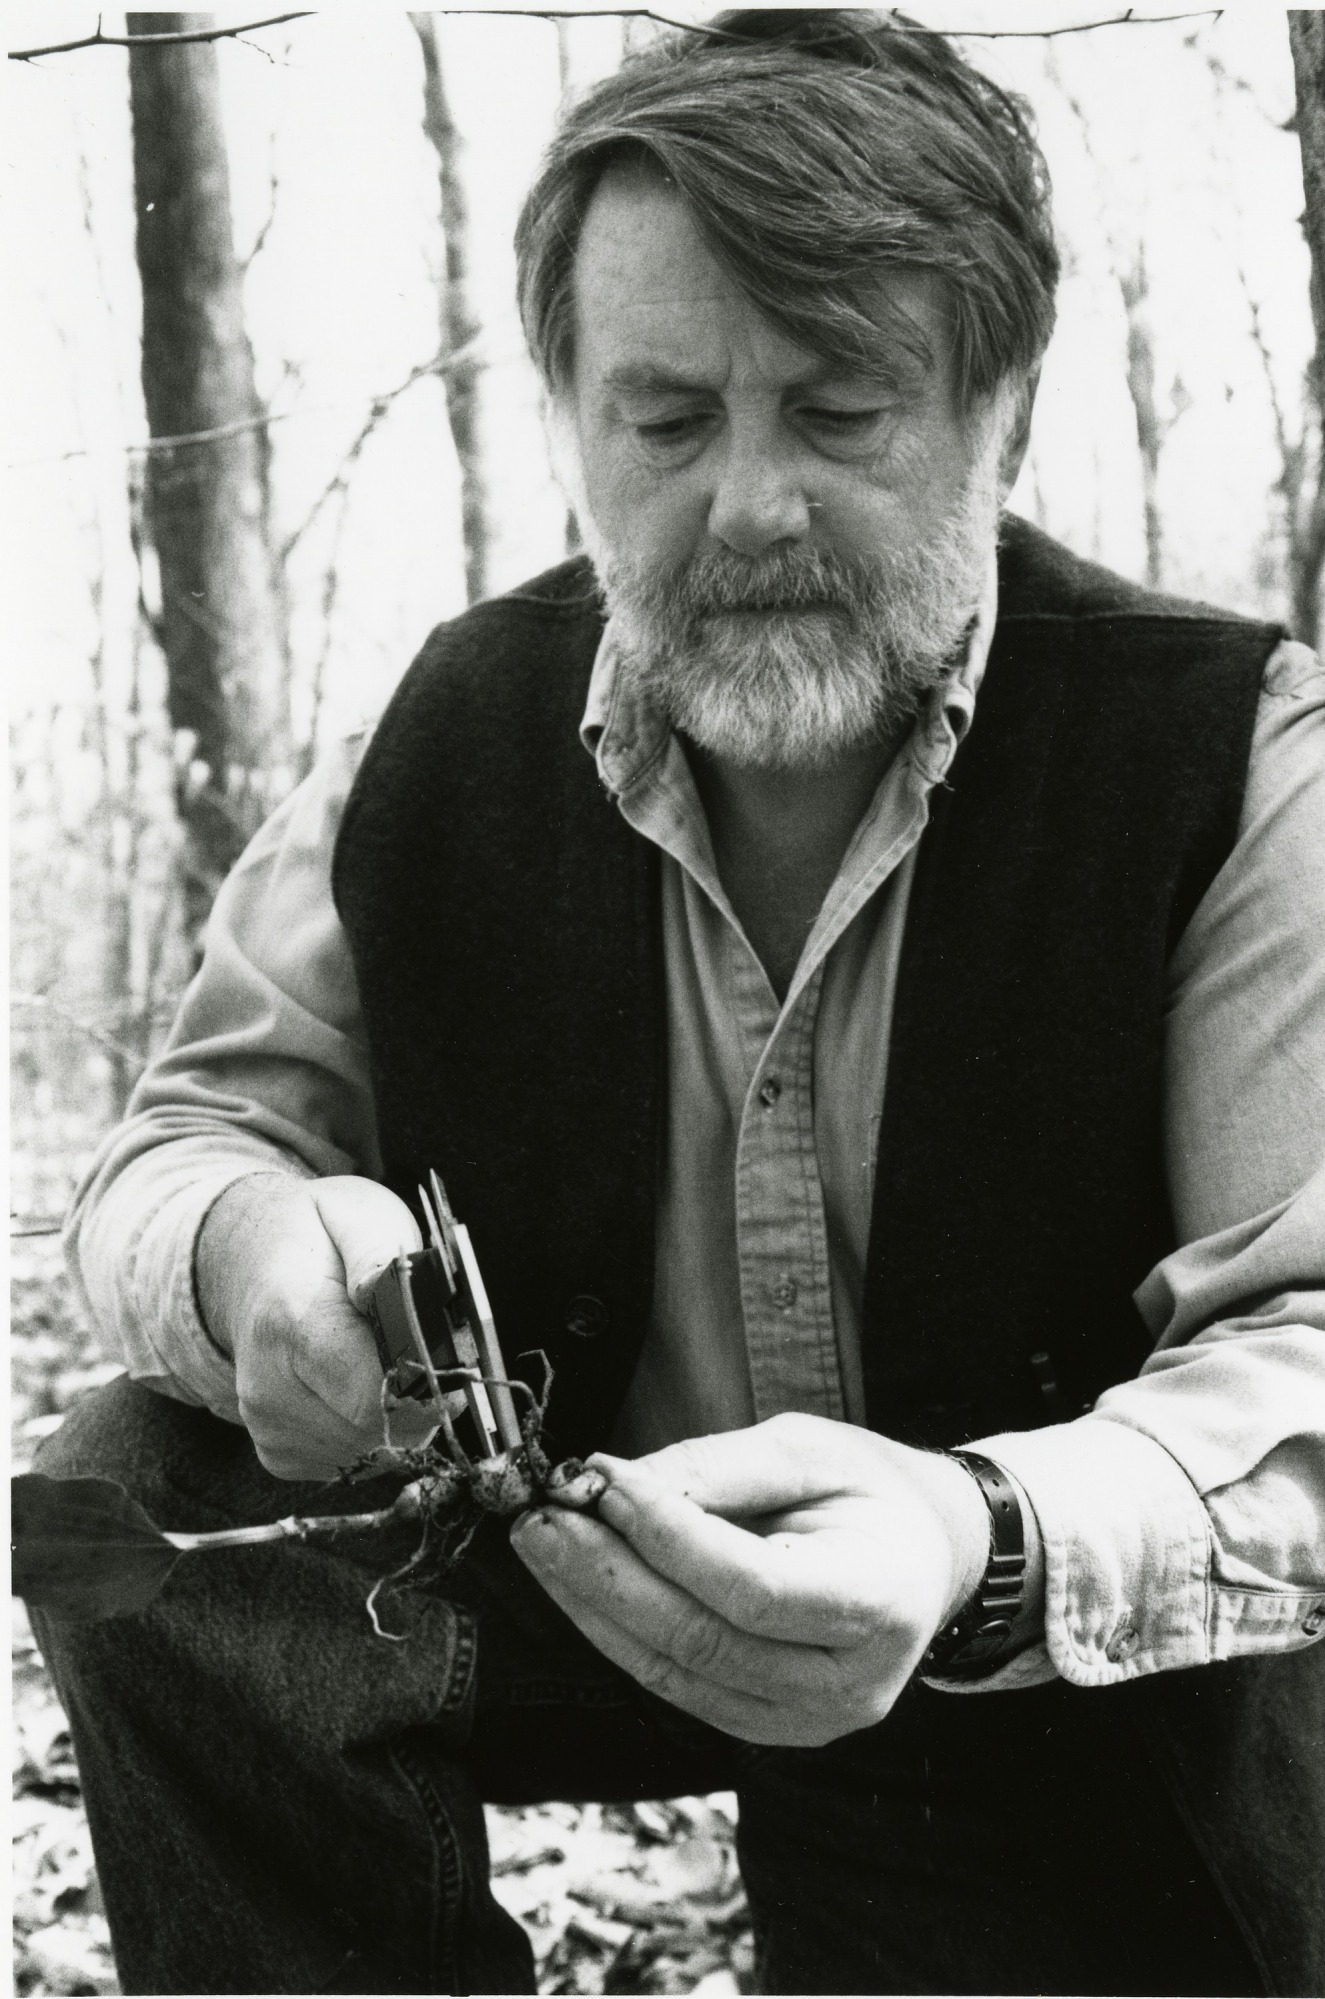 Dennis Whigham